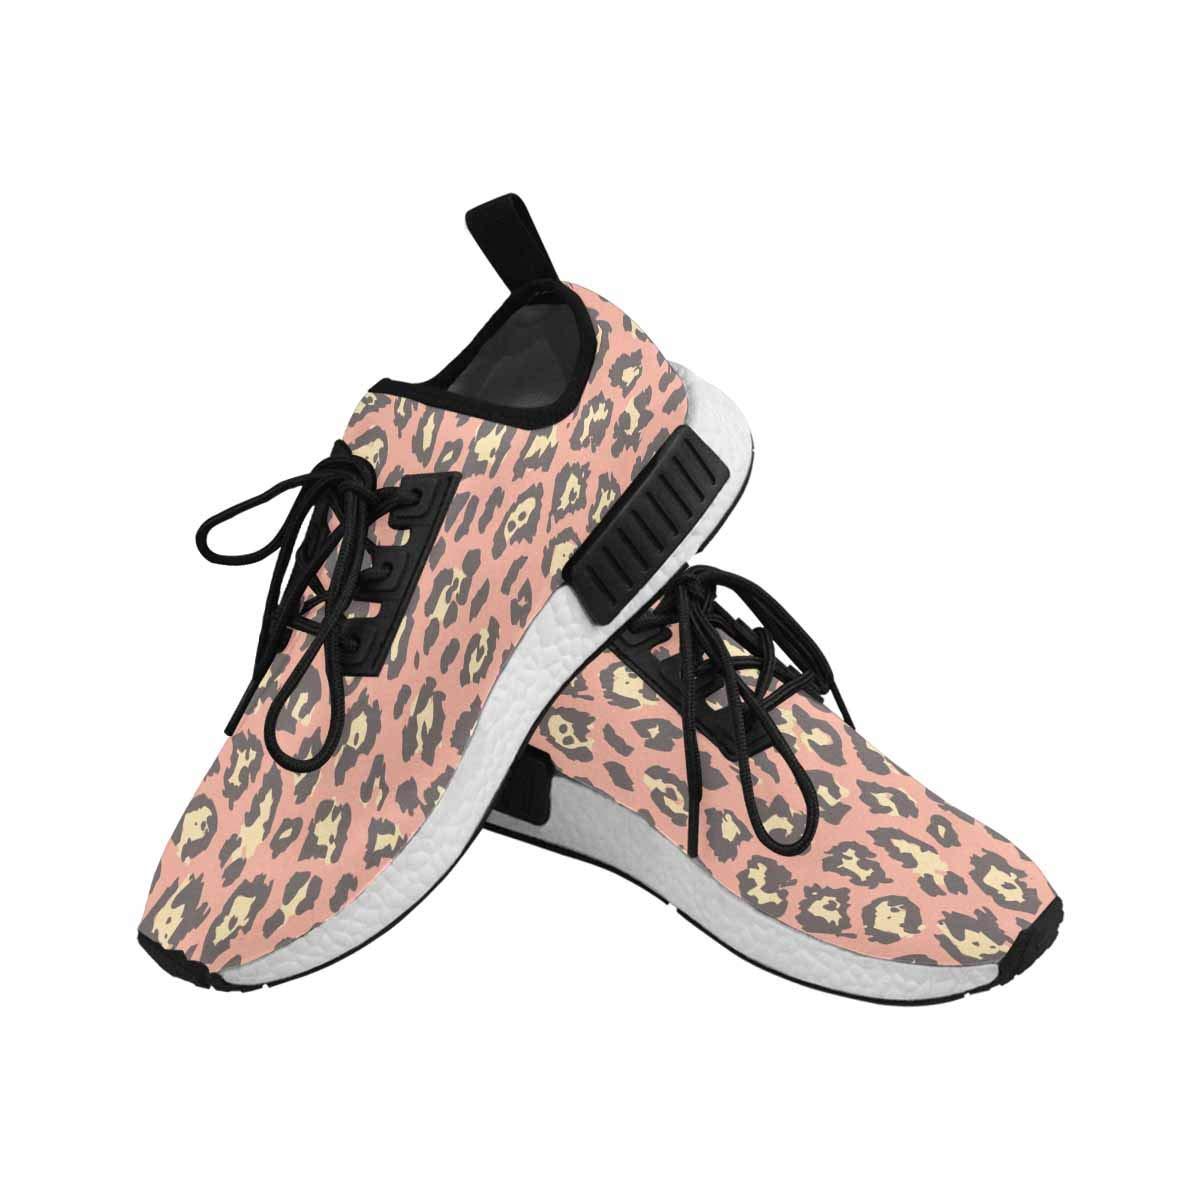 InterestPrint Women's Draco Running Comfort Sports Athletic Shoes Leopard Cheetah Skin 6 B(M) US